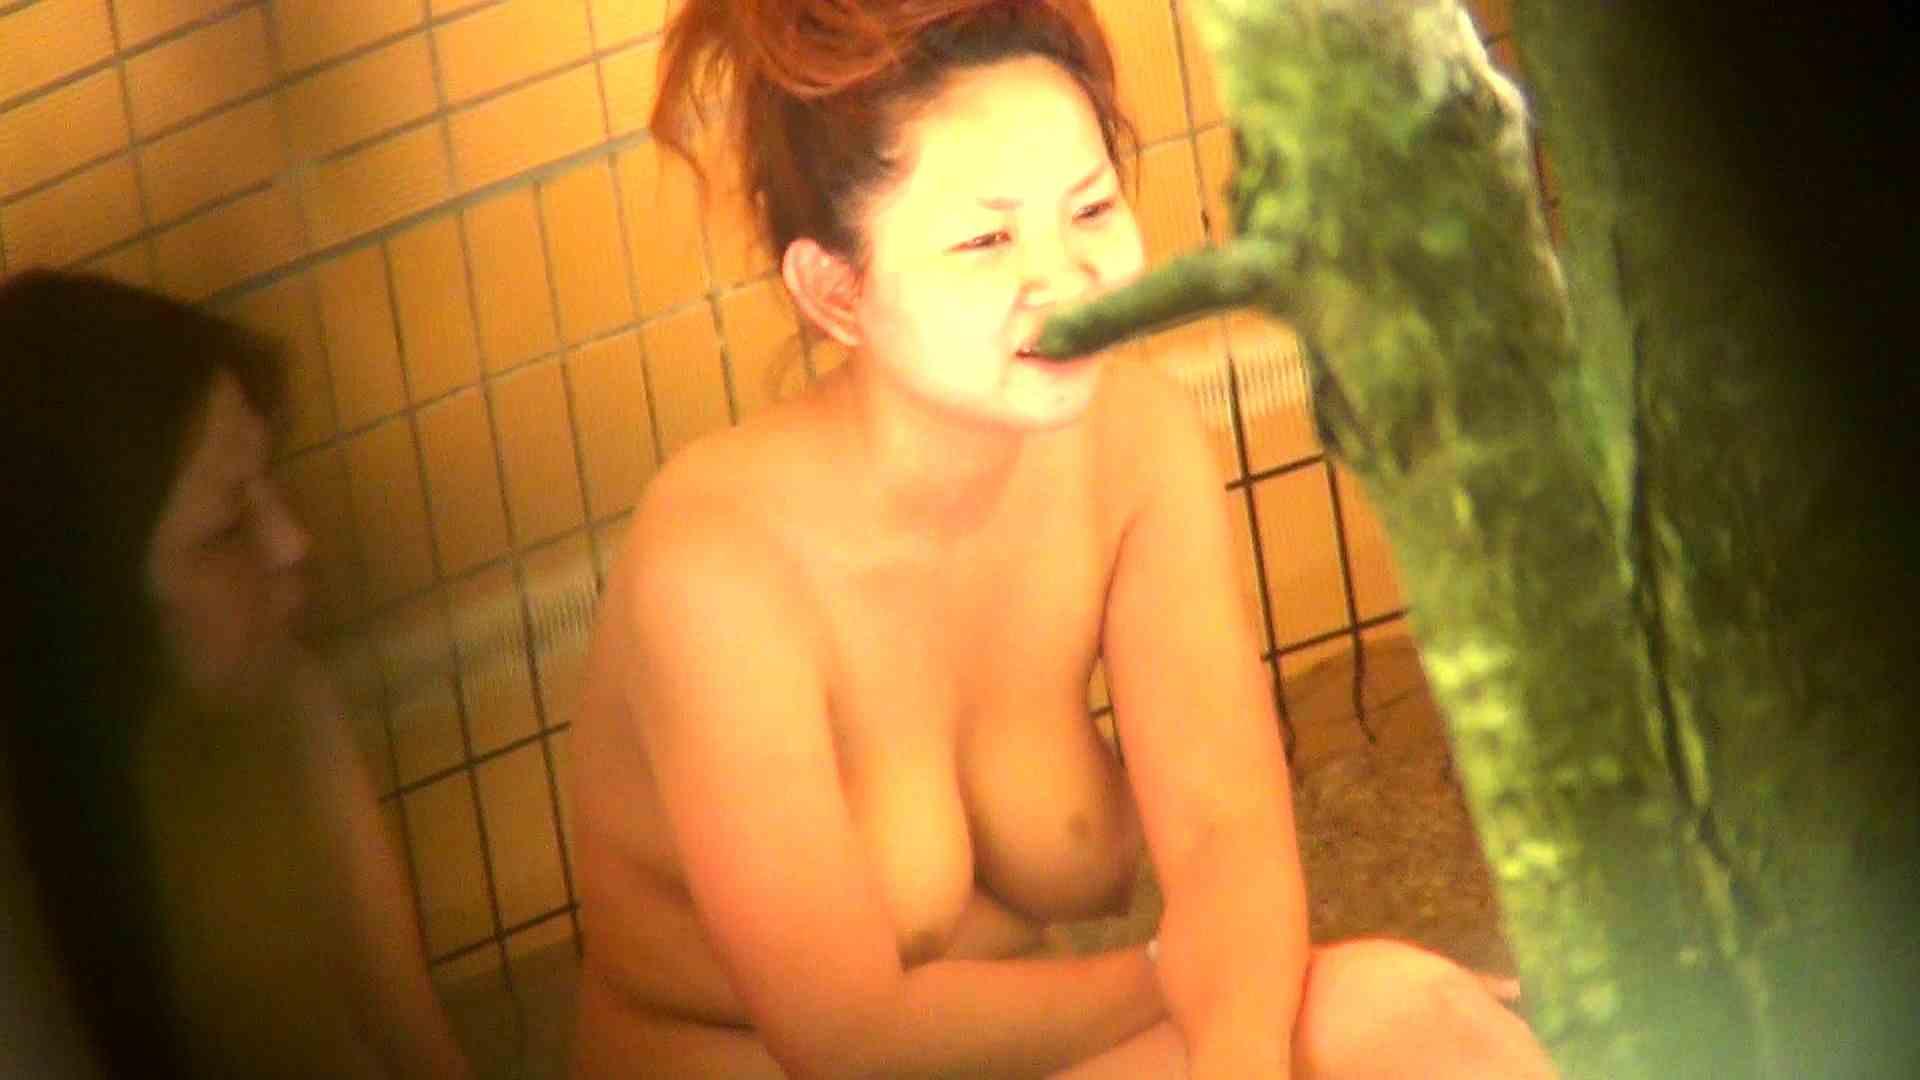 Vol.37 オデブと妊婦とokaasann 妊婦 盗撮動画紹介 69PIX 59